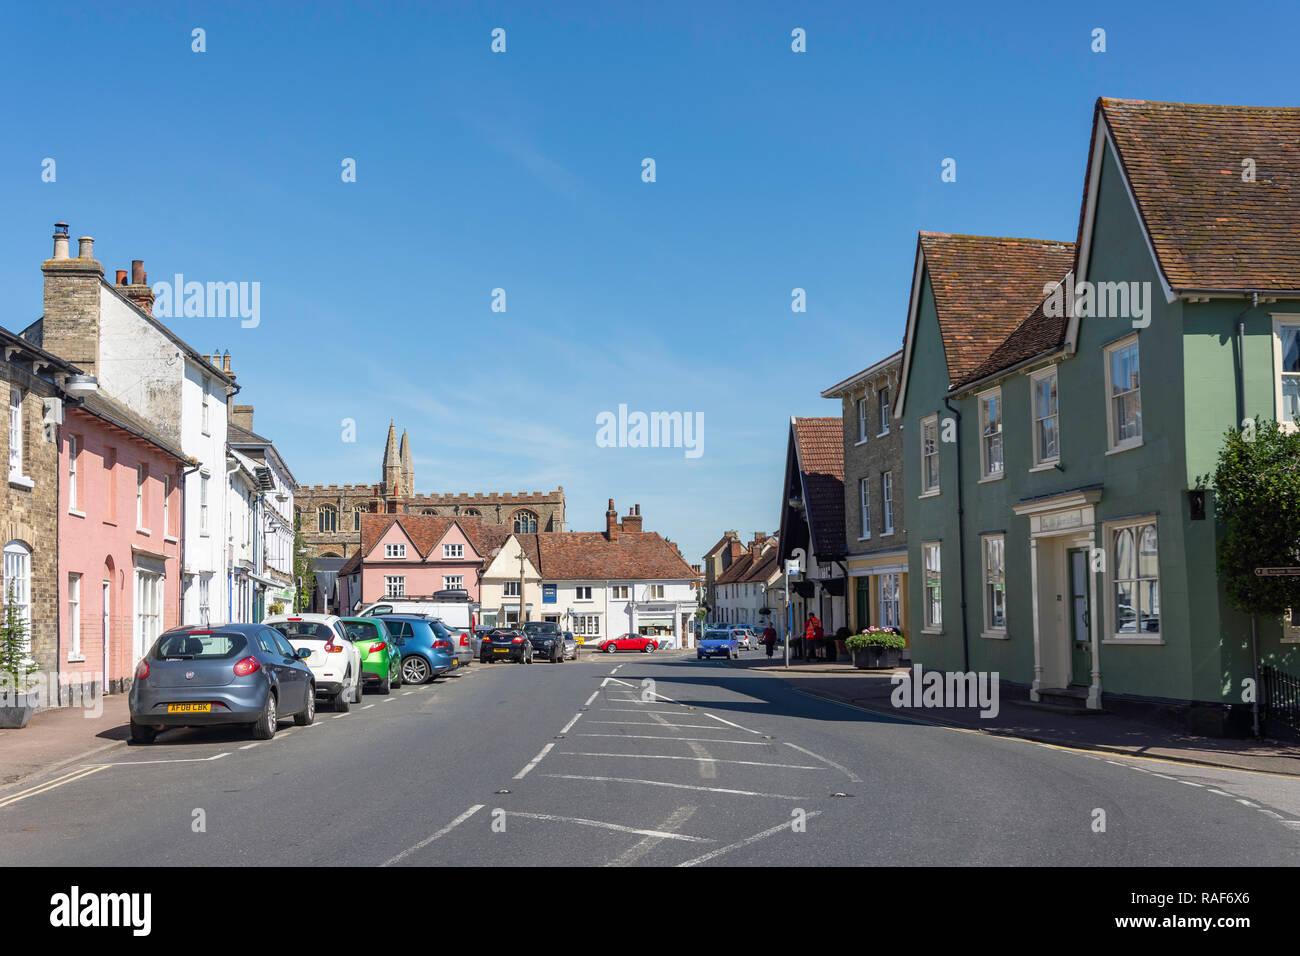 Market Hill, Clare, Suffolk, England, United Kingdom - Stock Image